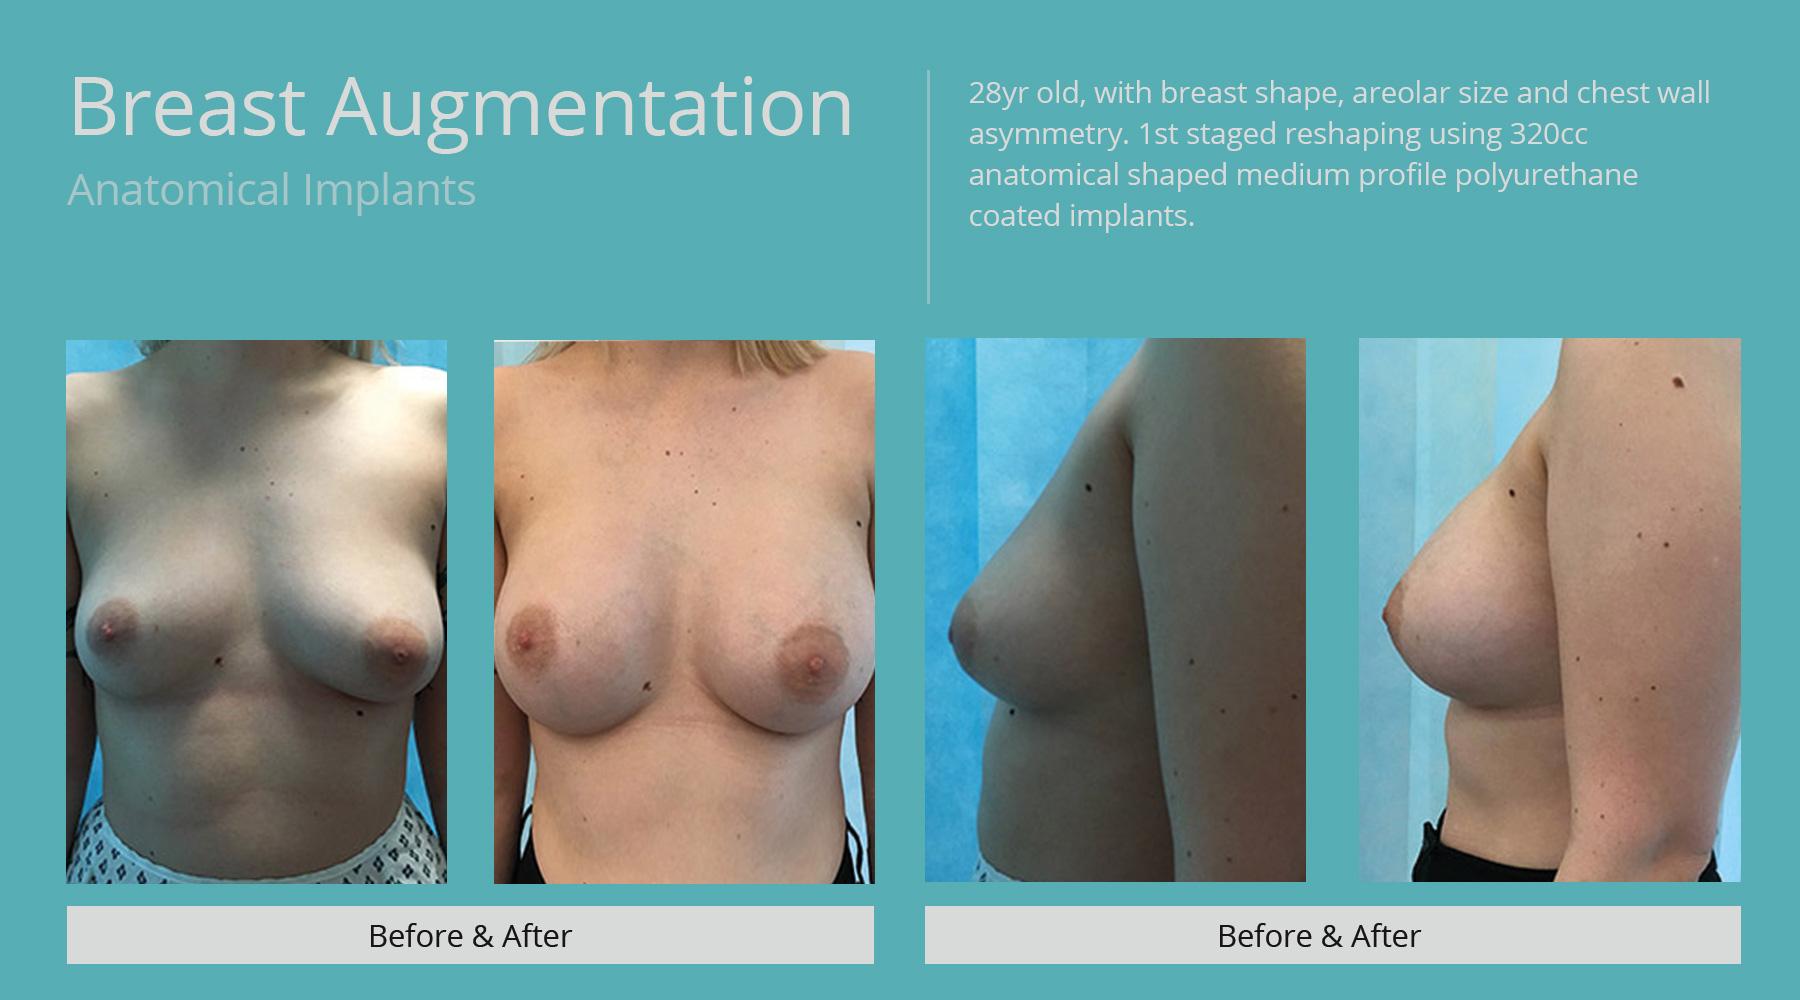 Breast-Augmentation-anatomical-25